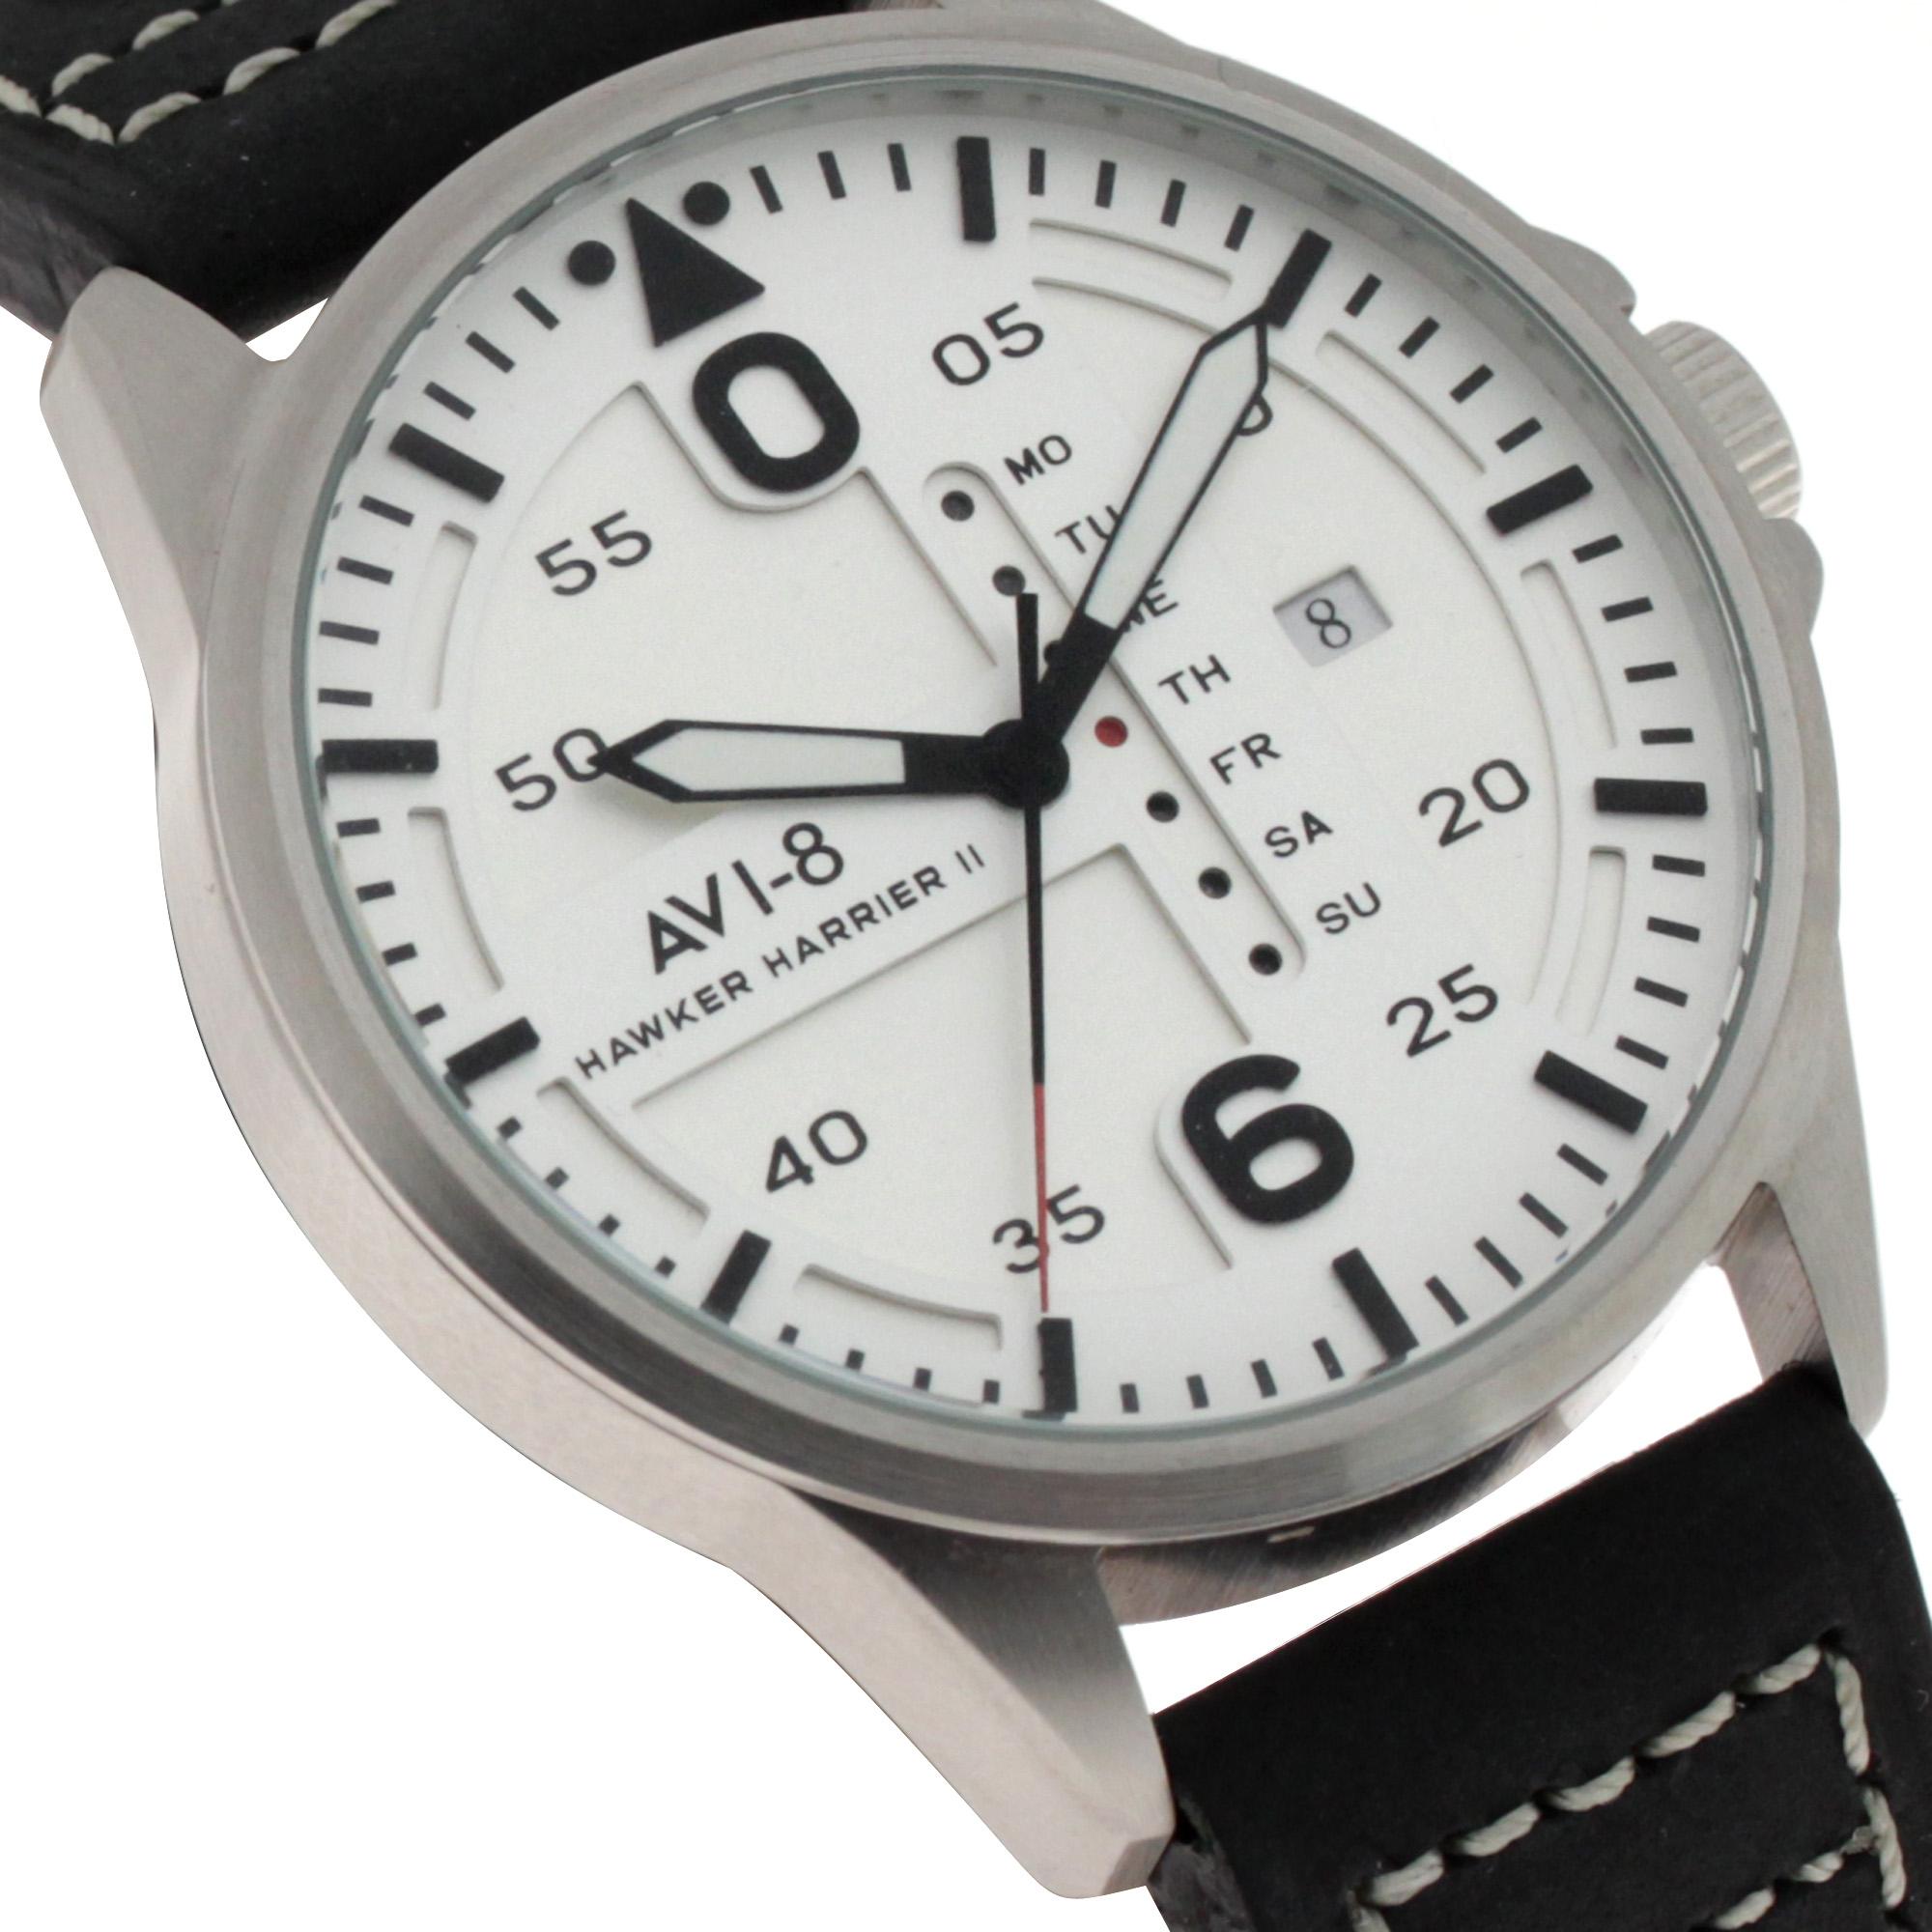 AV-4003-01